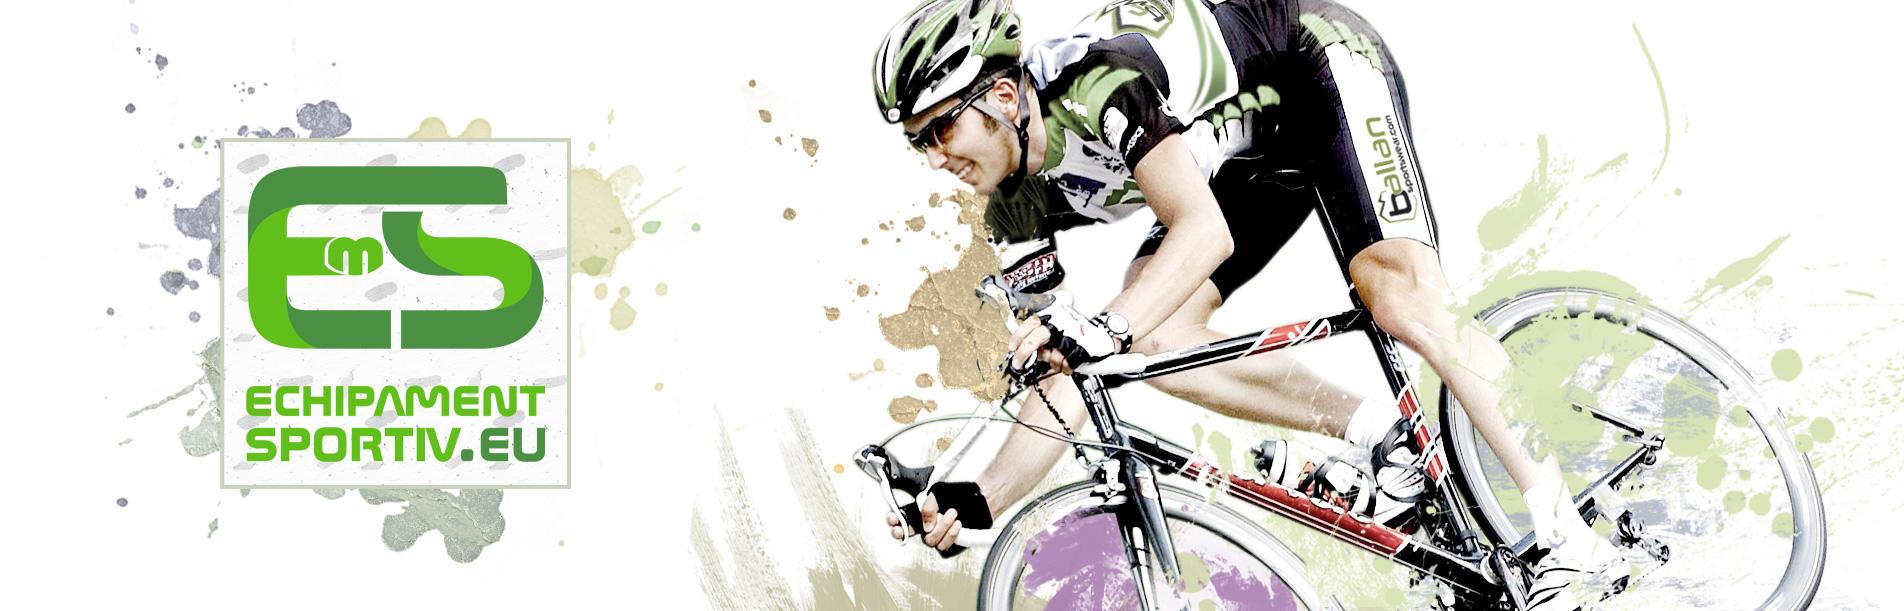 Echipament ciclism personalizat